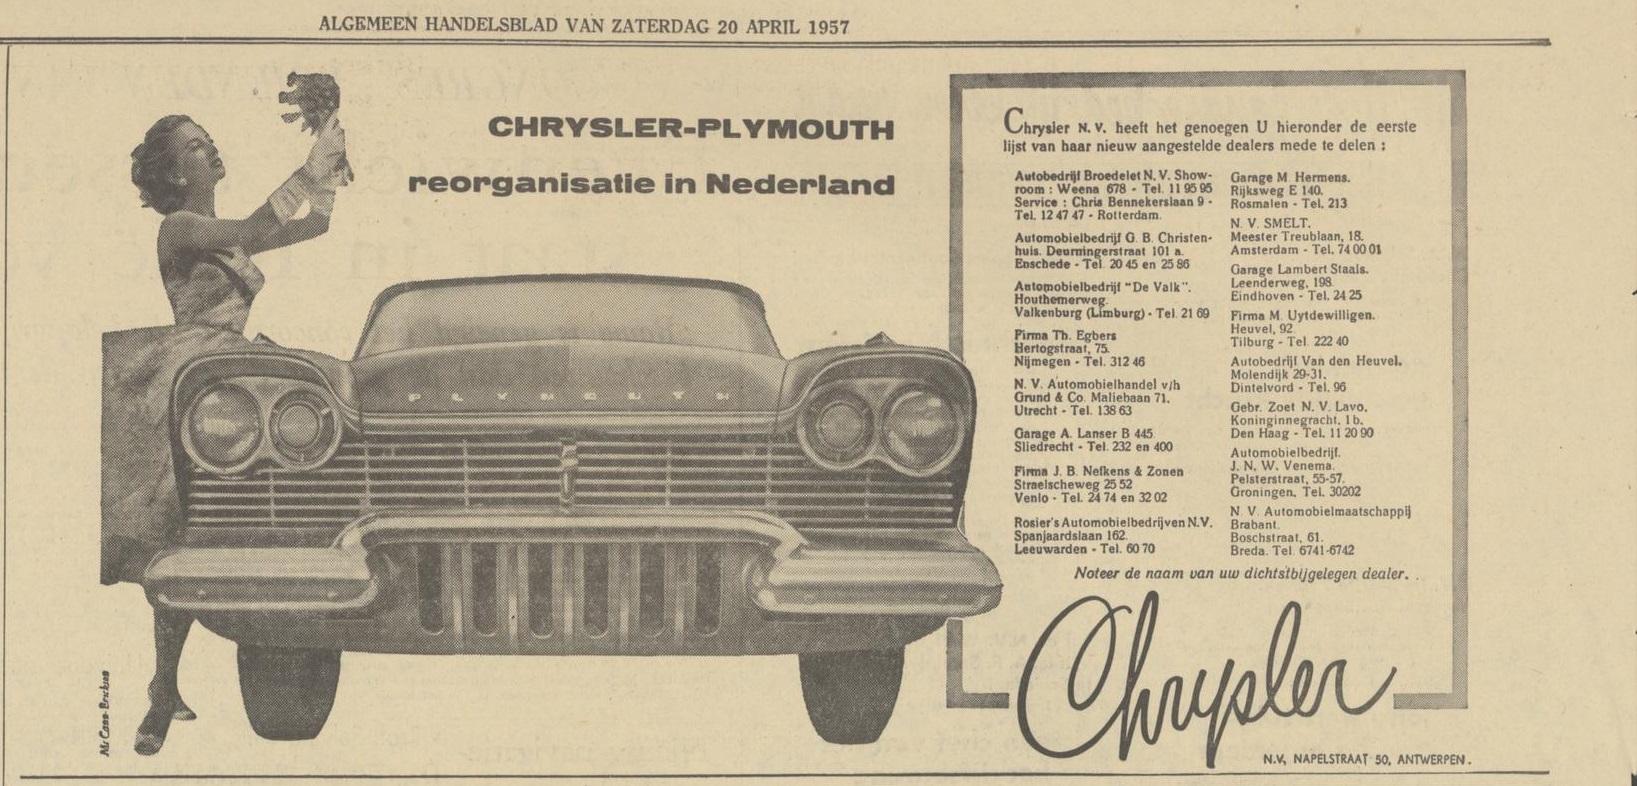 1957 20 april algemeen handelsblad